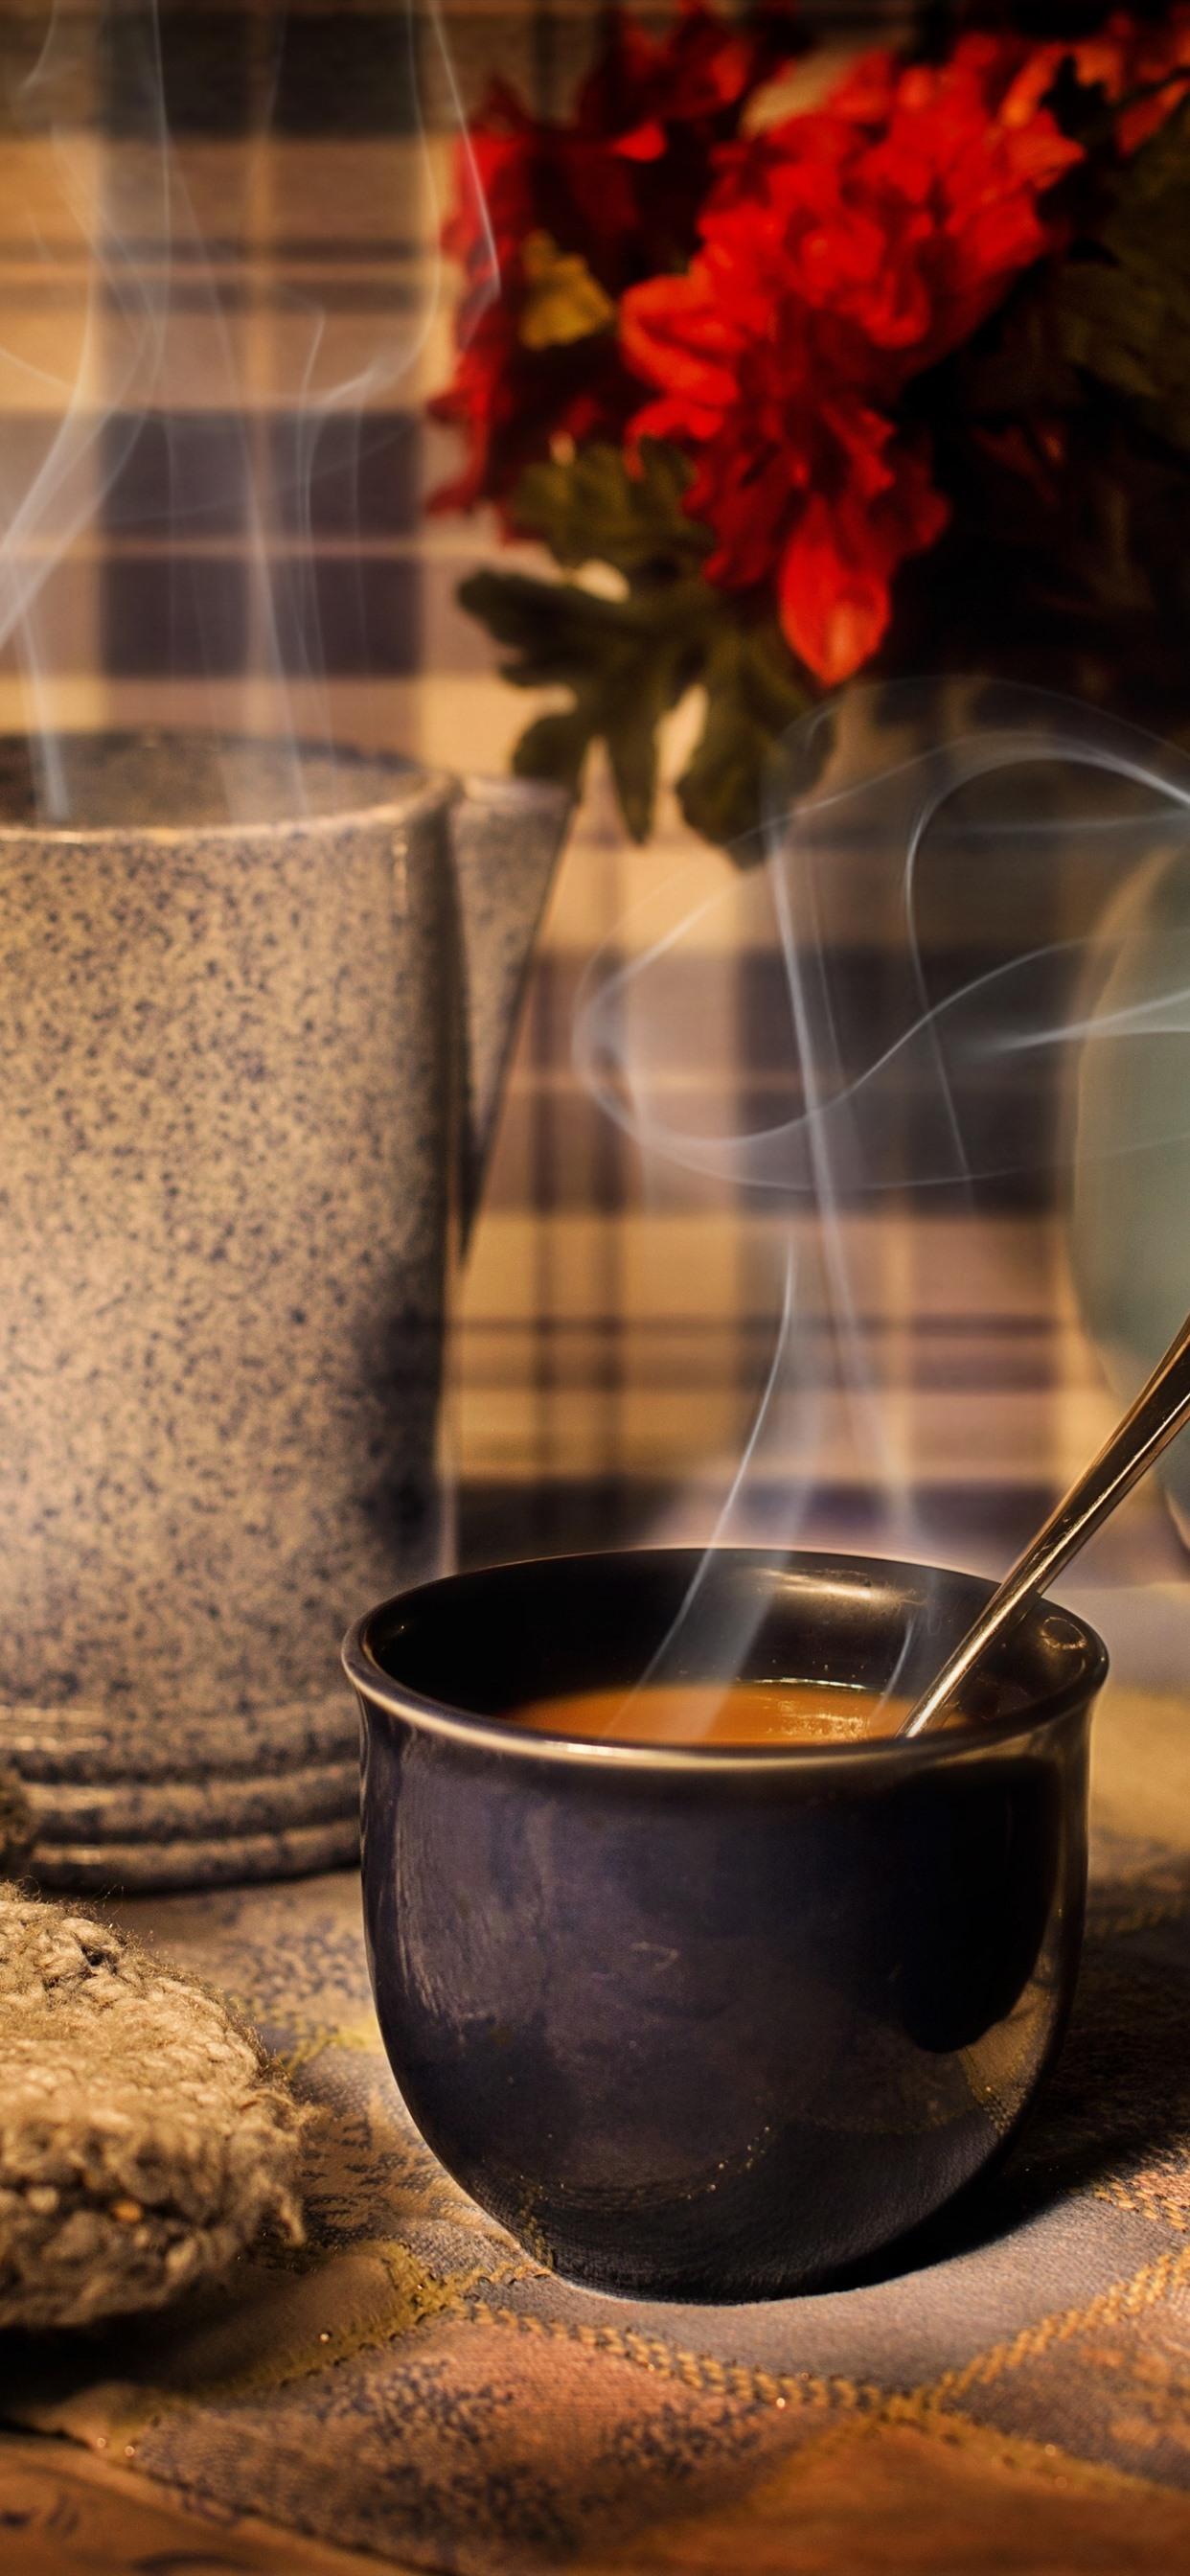 Cup Coffee Mug Flowers Steam 1242x2688 Iphone Xs Max